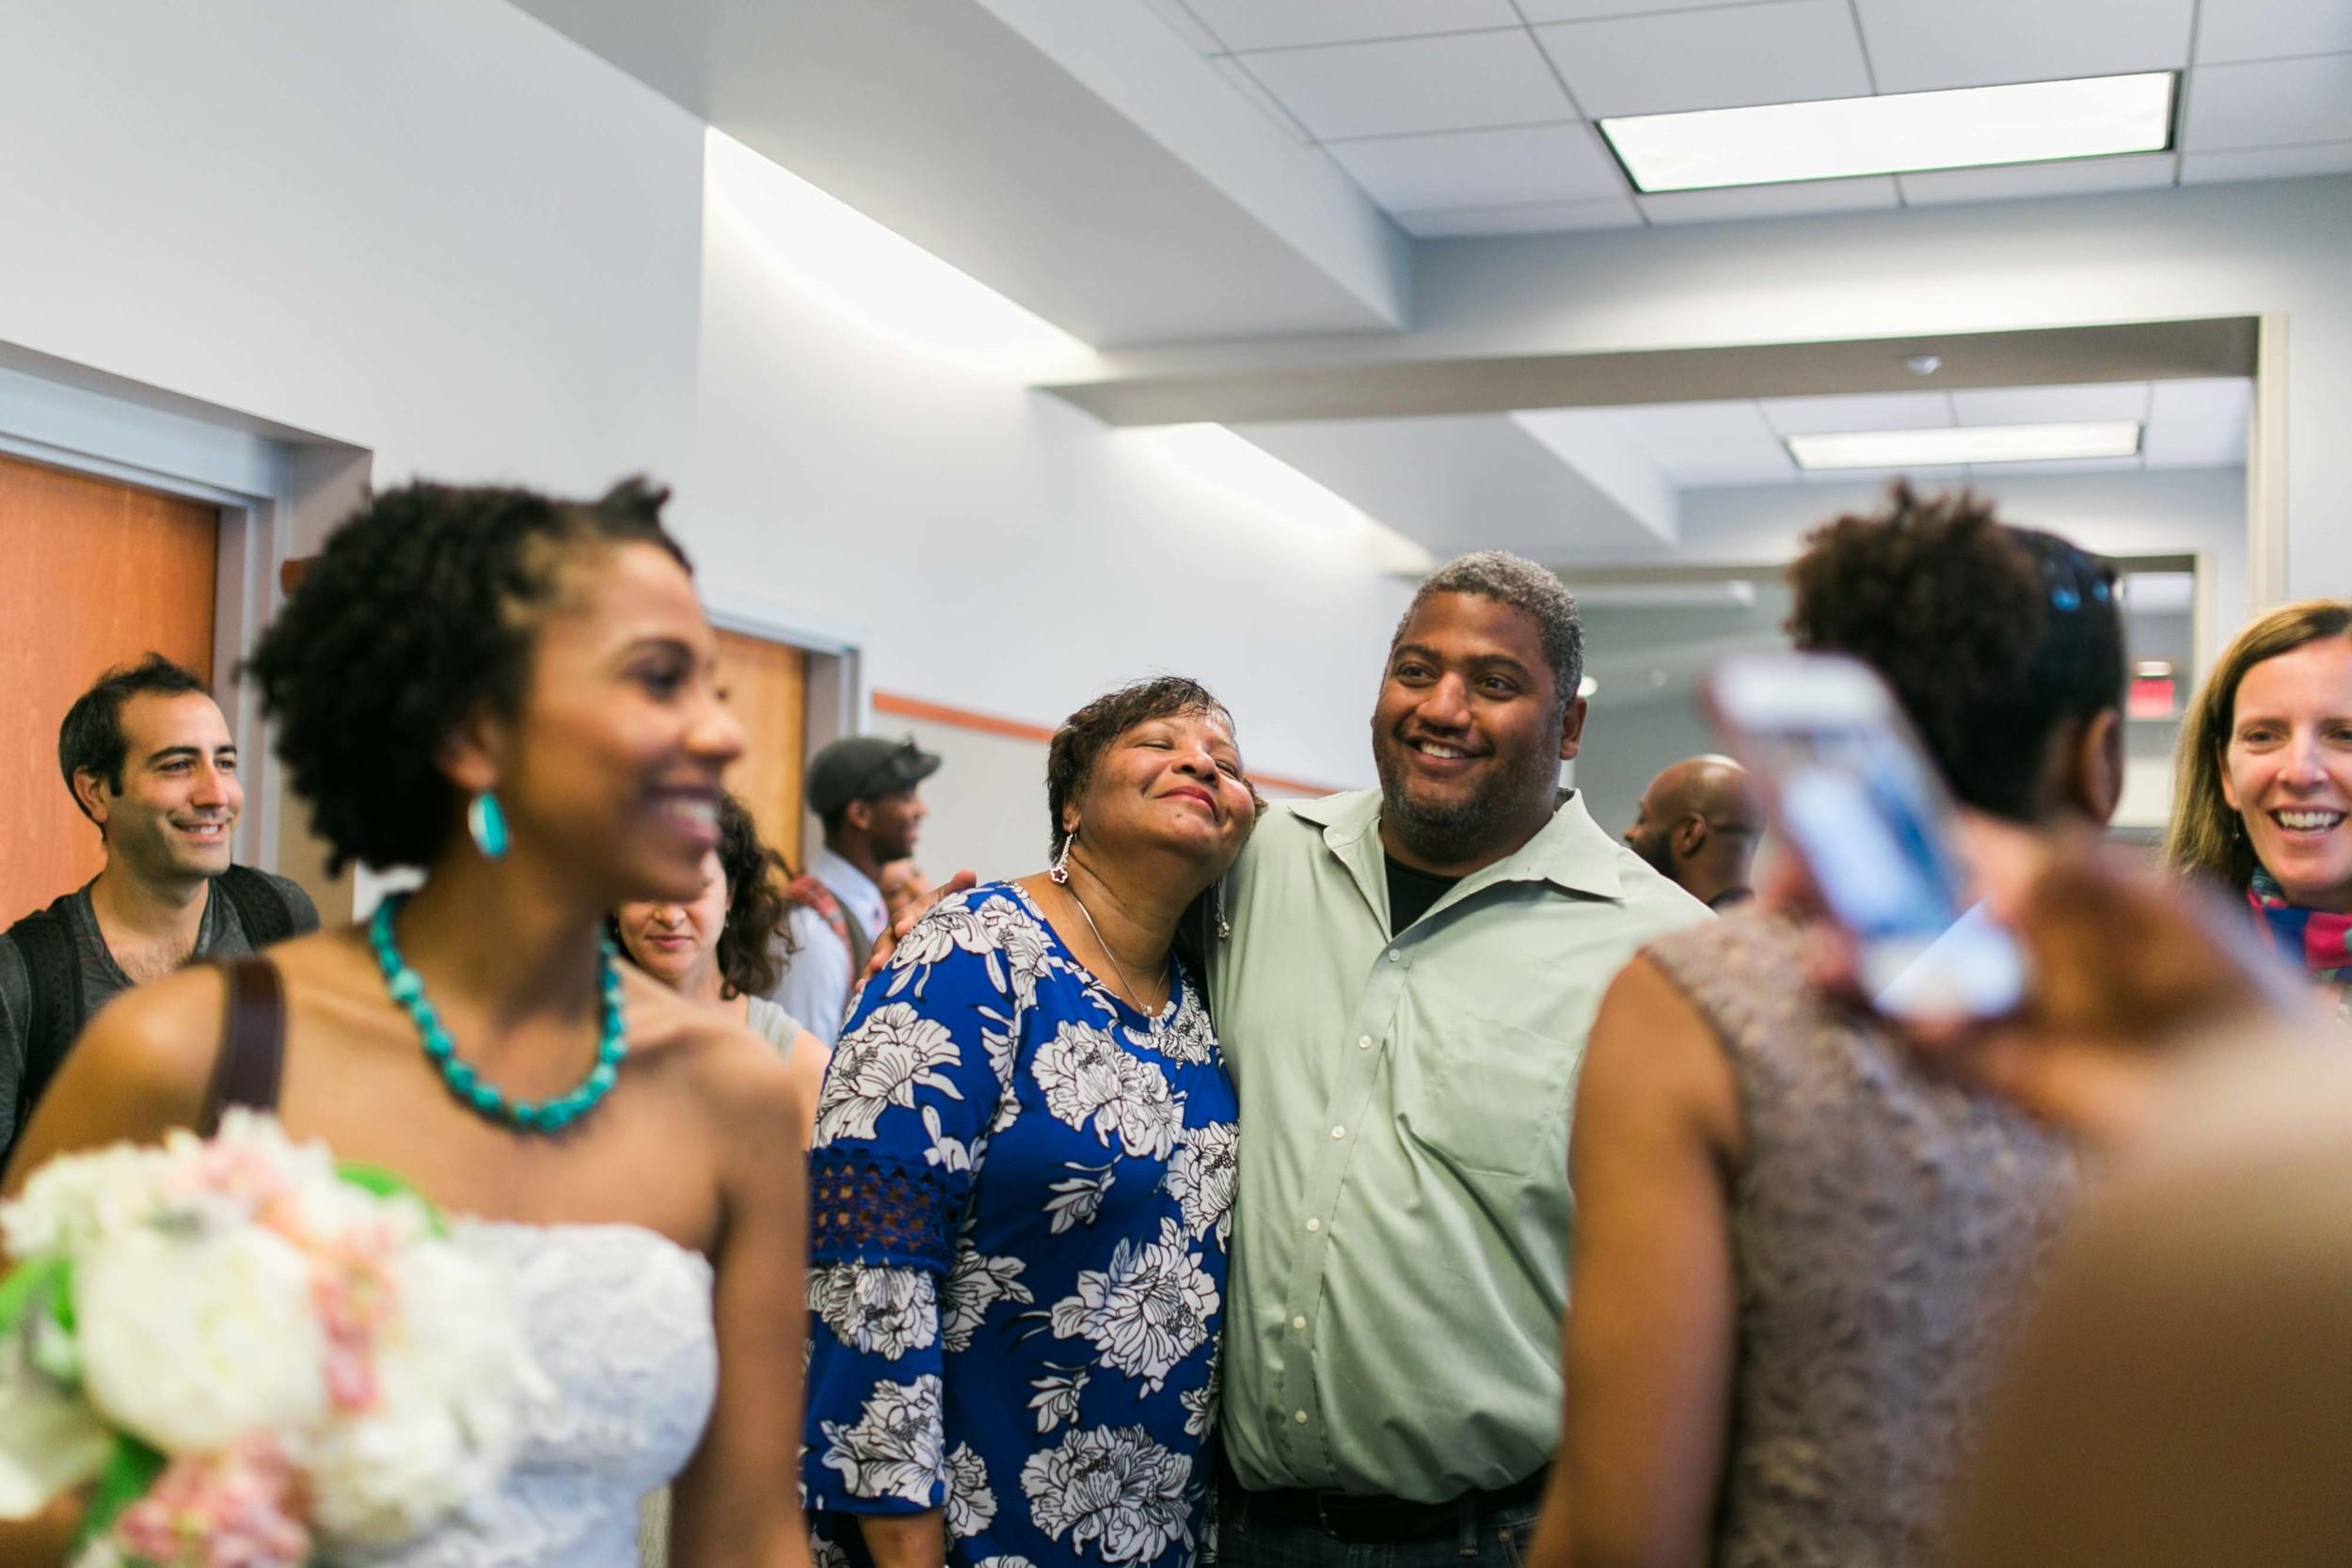 Dekalb-County-Courthouse-Wedding-Photos-Kiyah-C-Photography-31.jpg